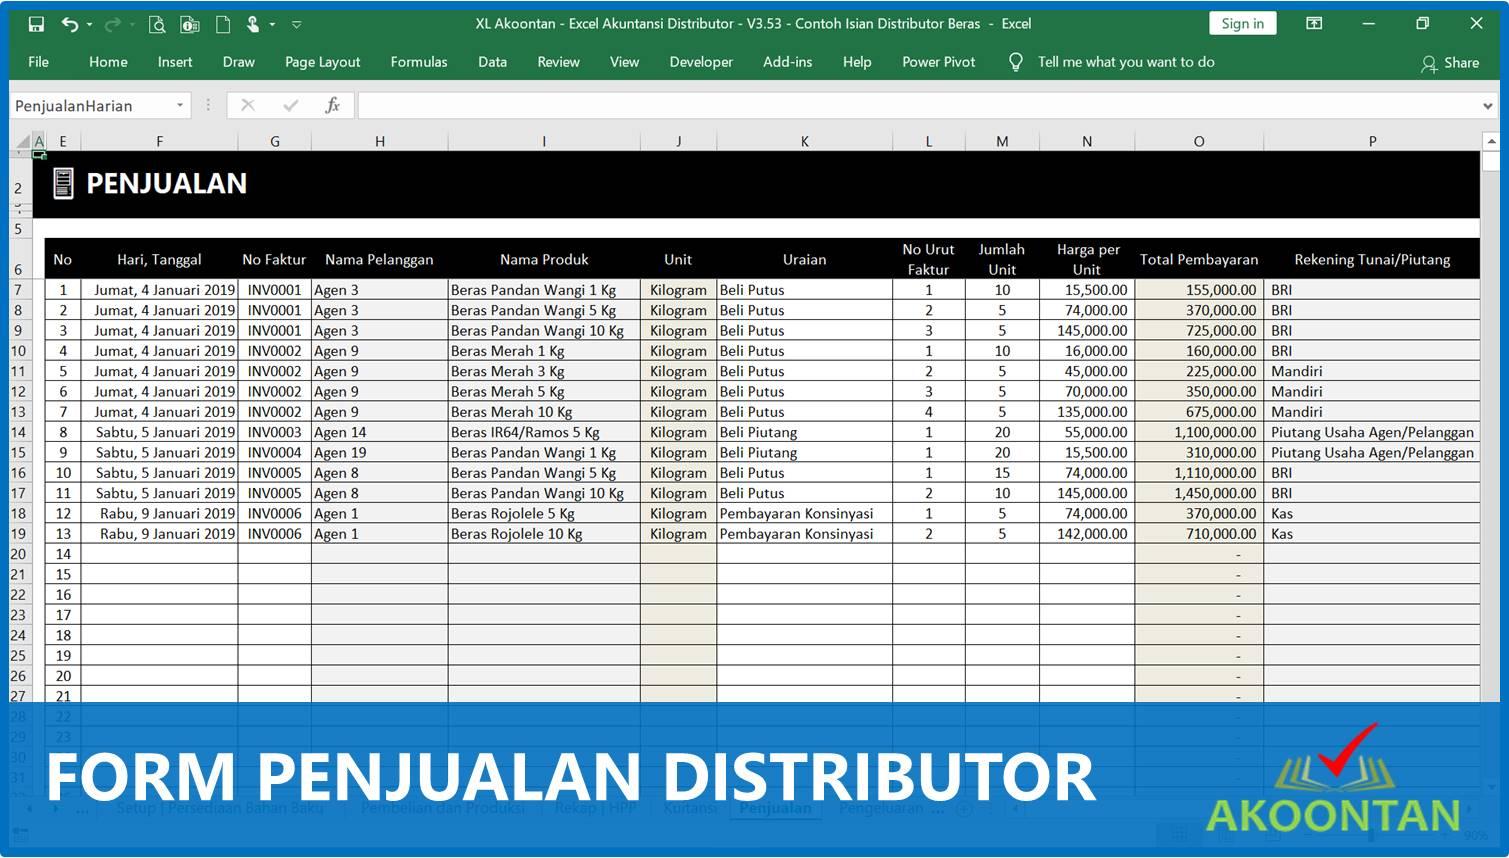 Form Penjualan Distributor - Akuntansi-ID